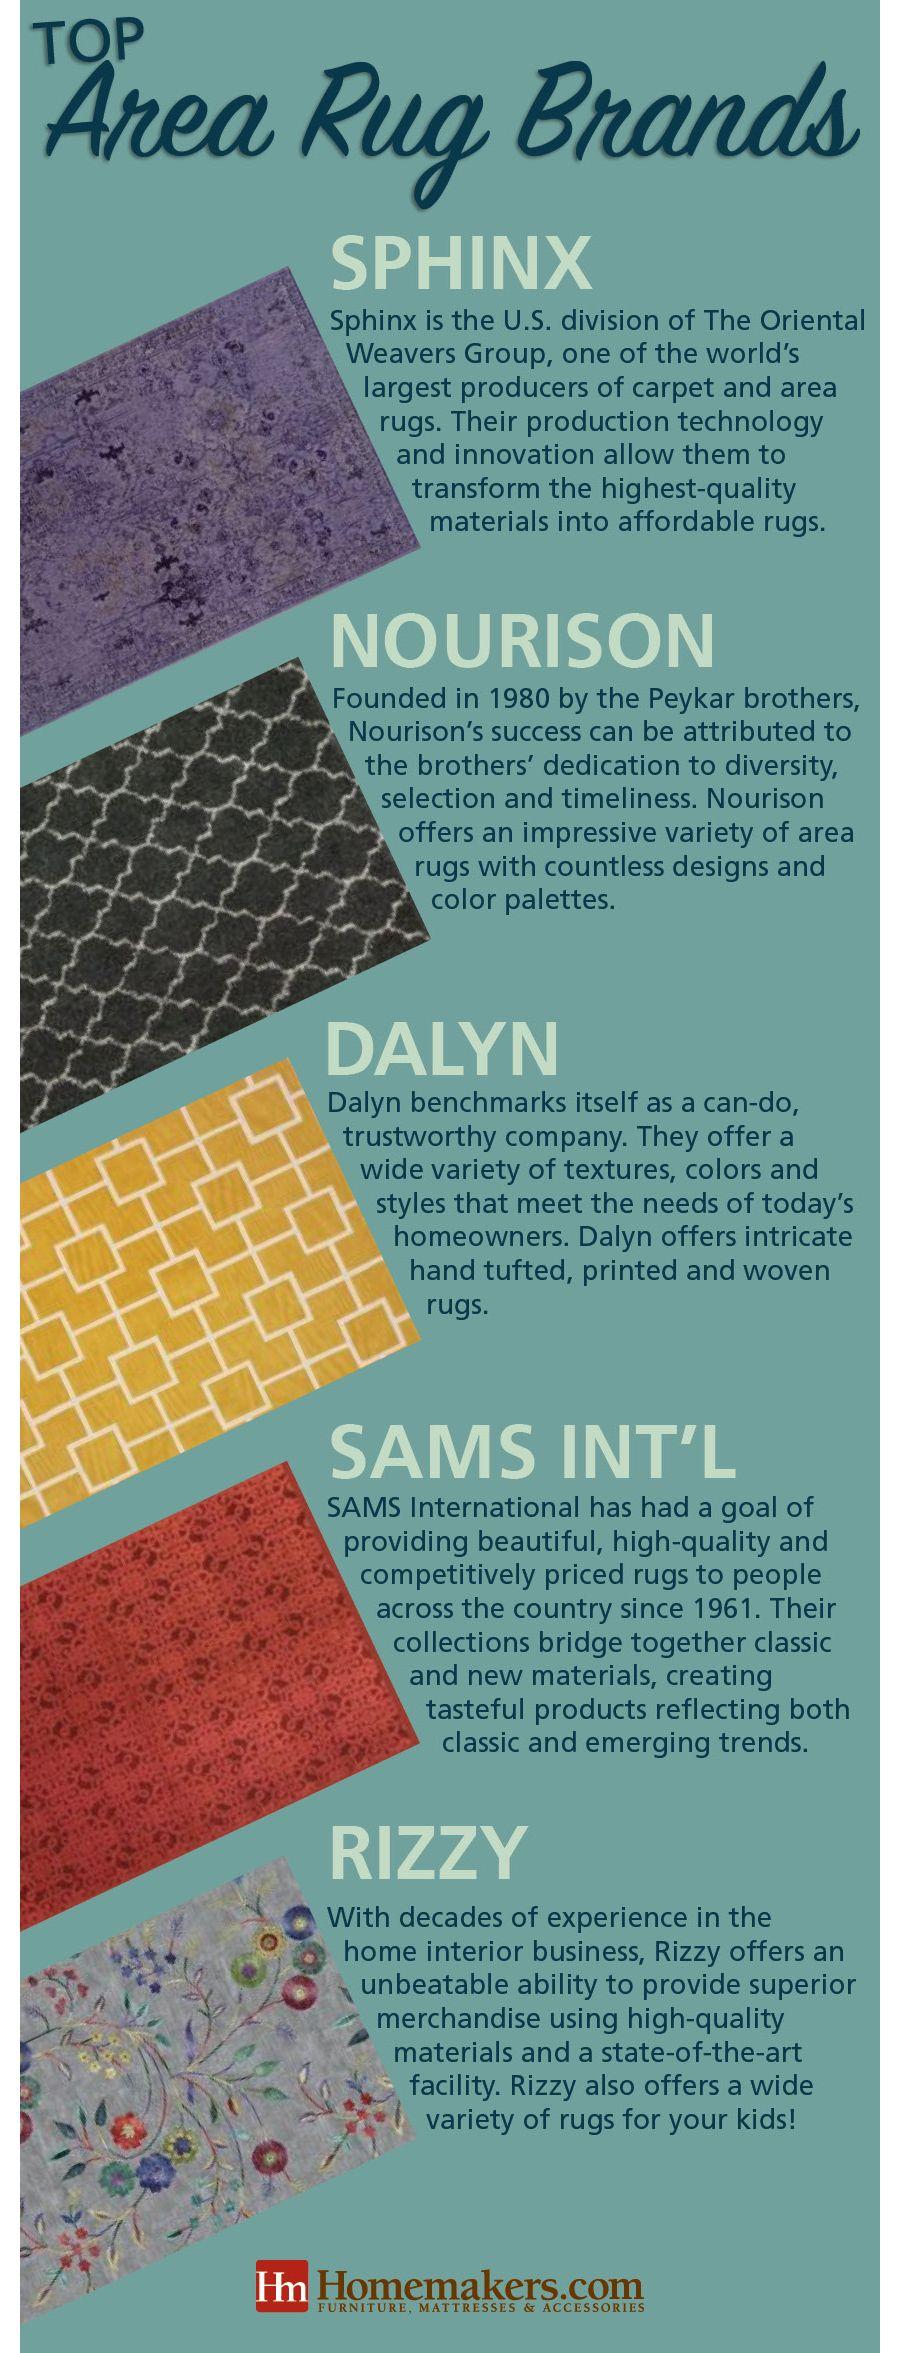 Best Area Rug Brands infographic